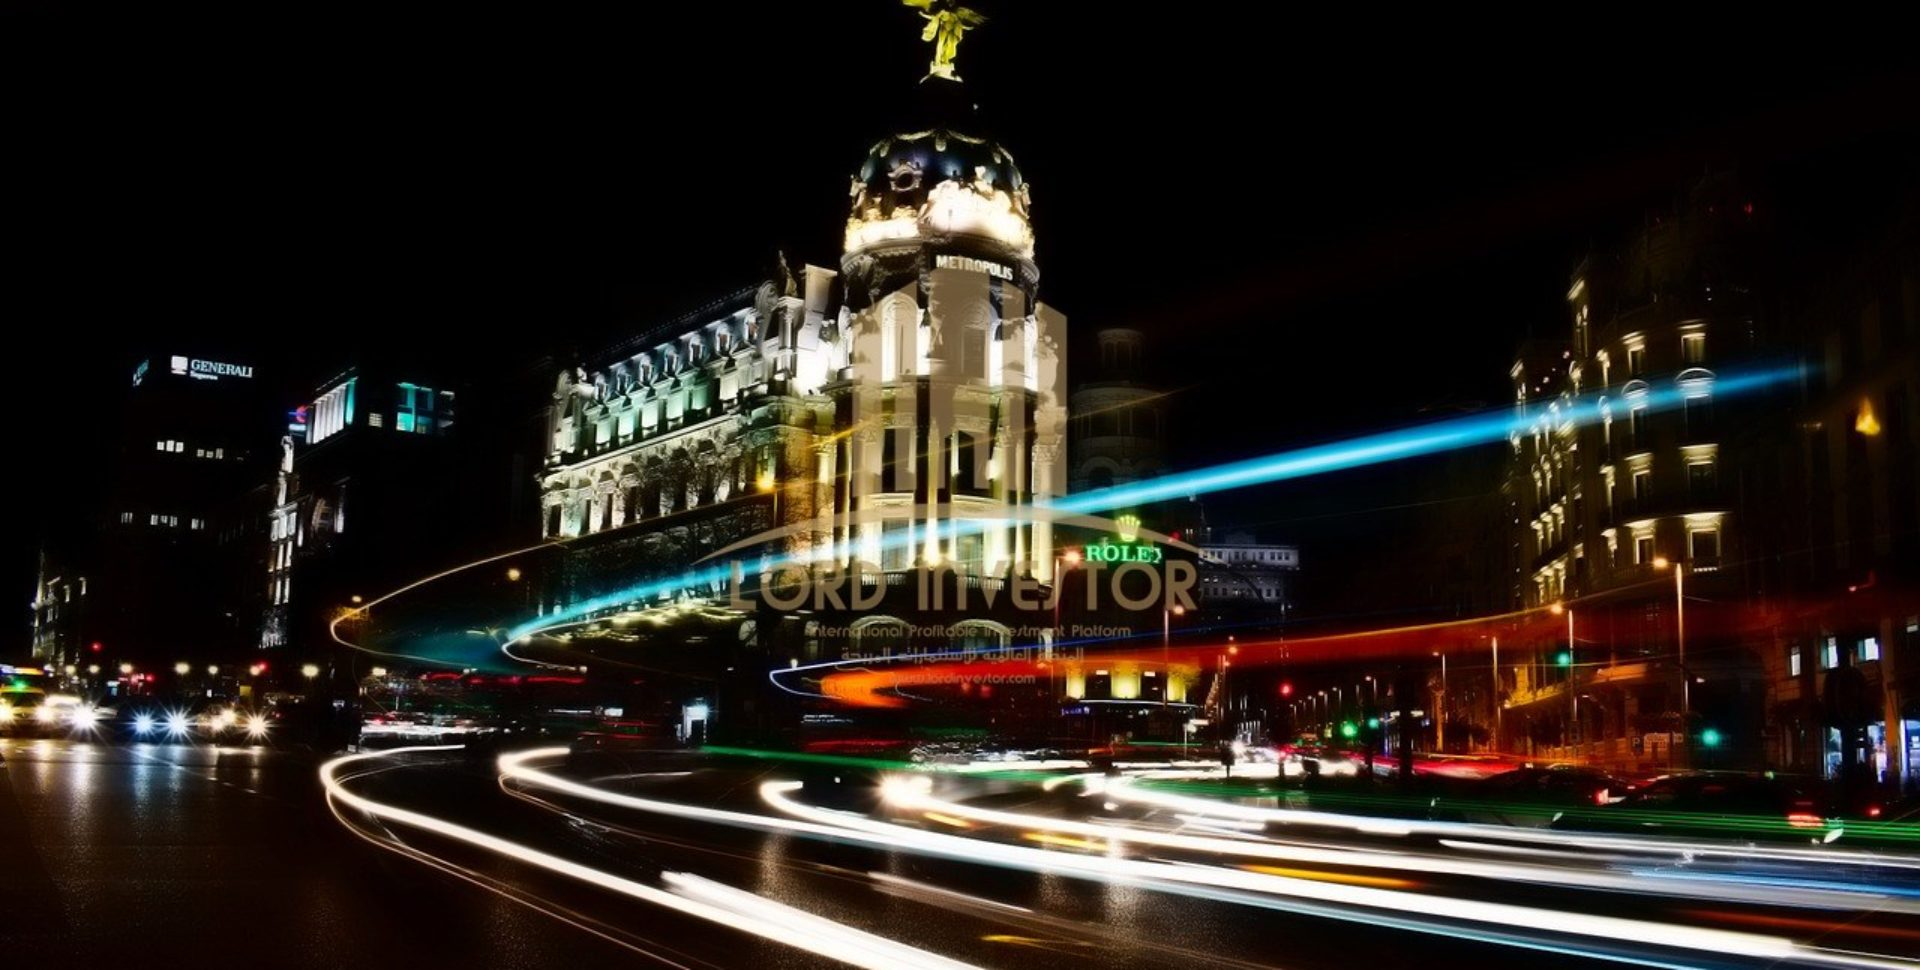 Building & Exclusive Luxury New Delevopment in Madrid